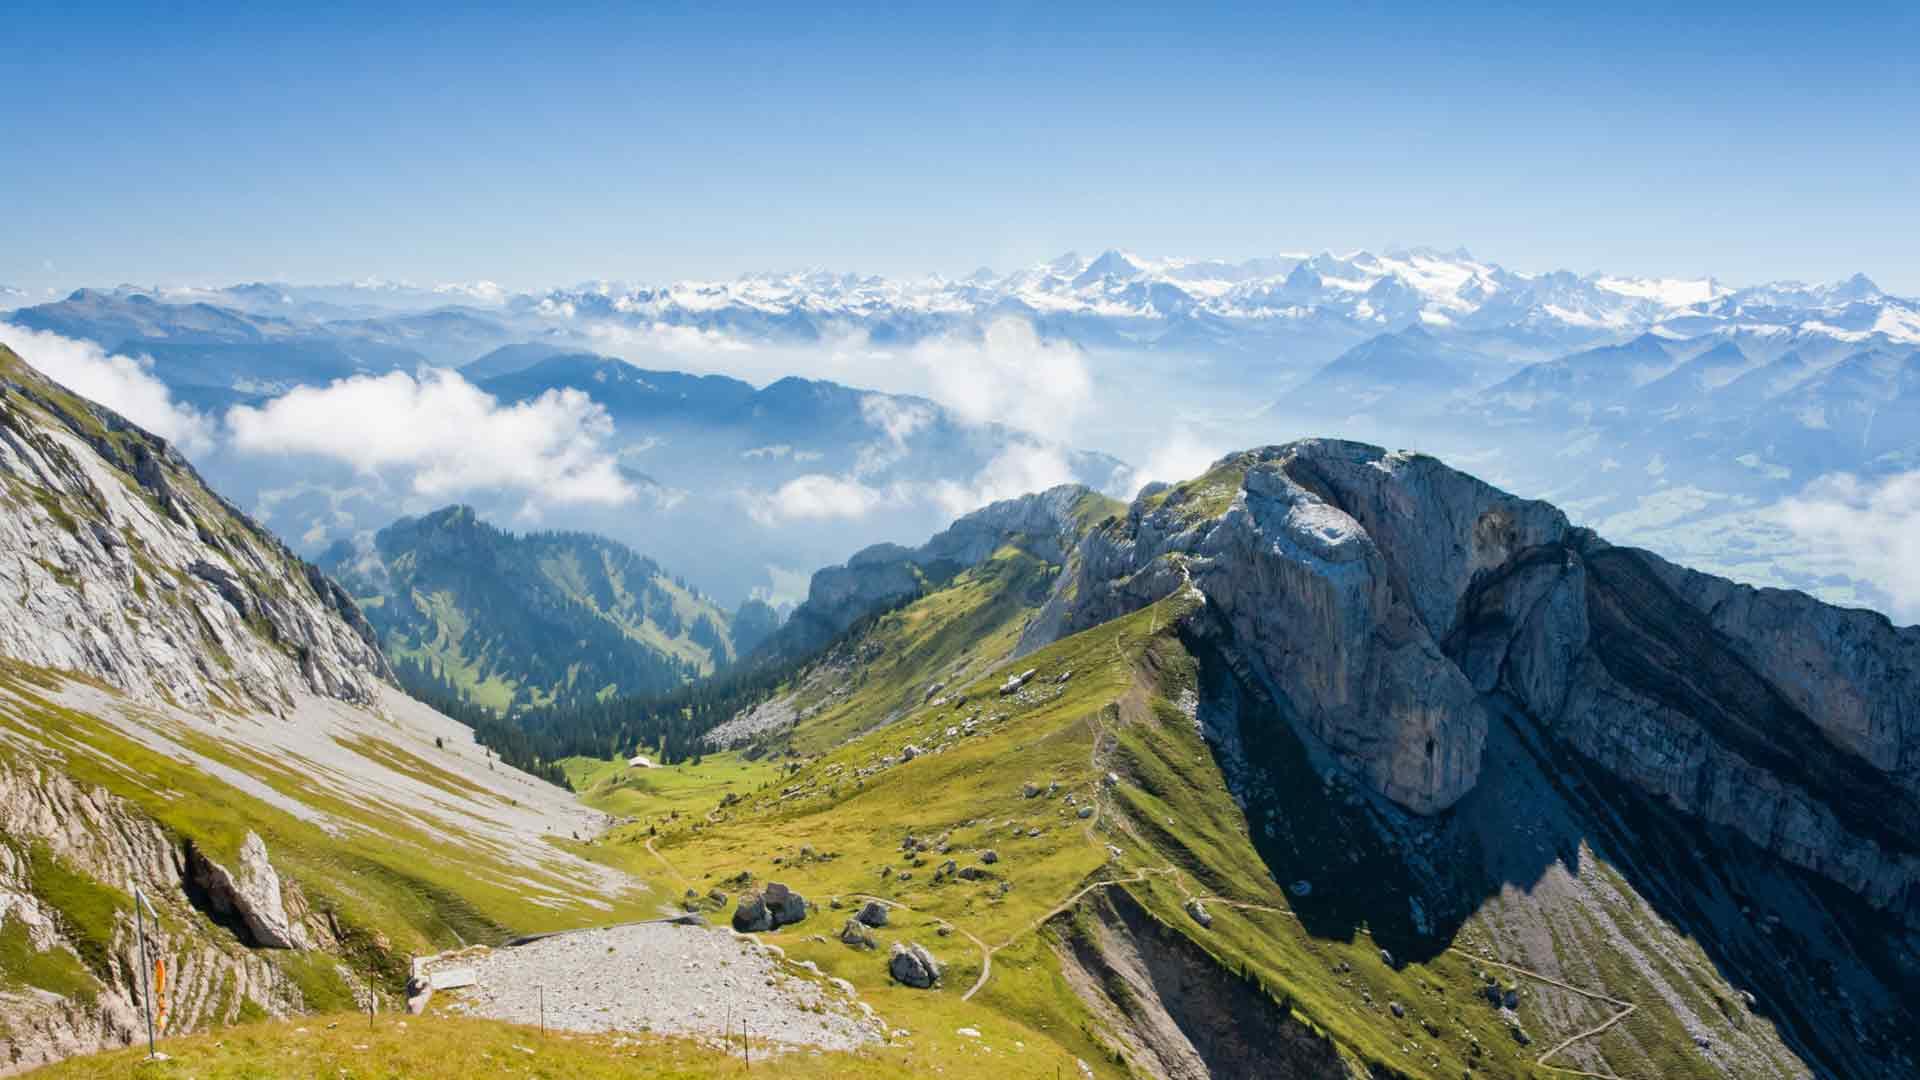 Широкоформатные обои Кавказские горы ...: www.fullhdoboi.ru/photo/nature/kavkazskie_gory/6-0-29108